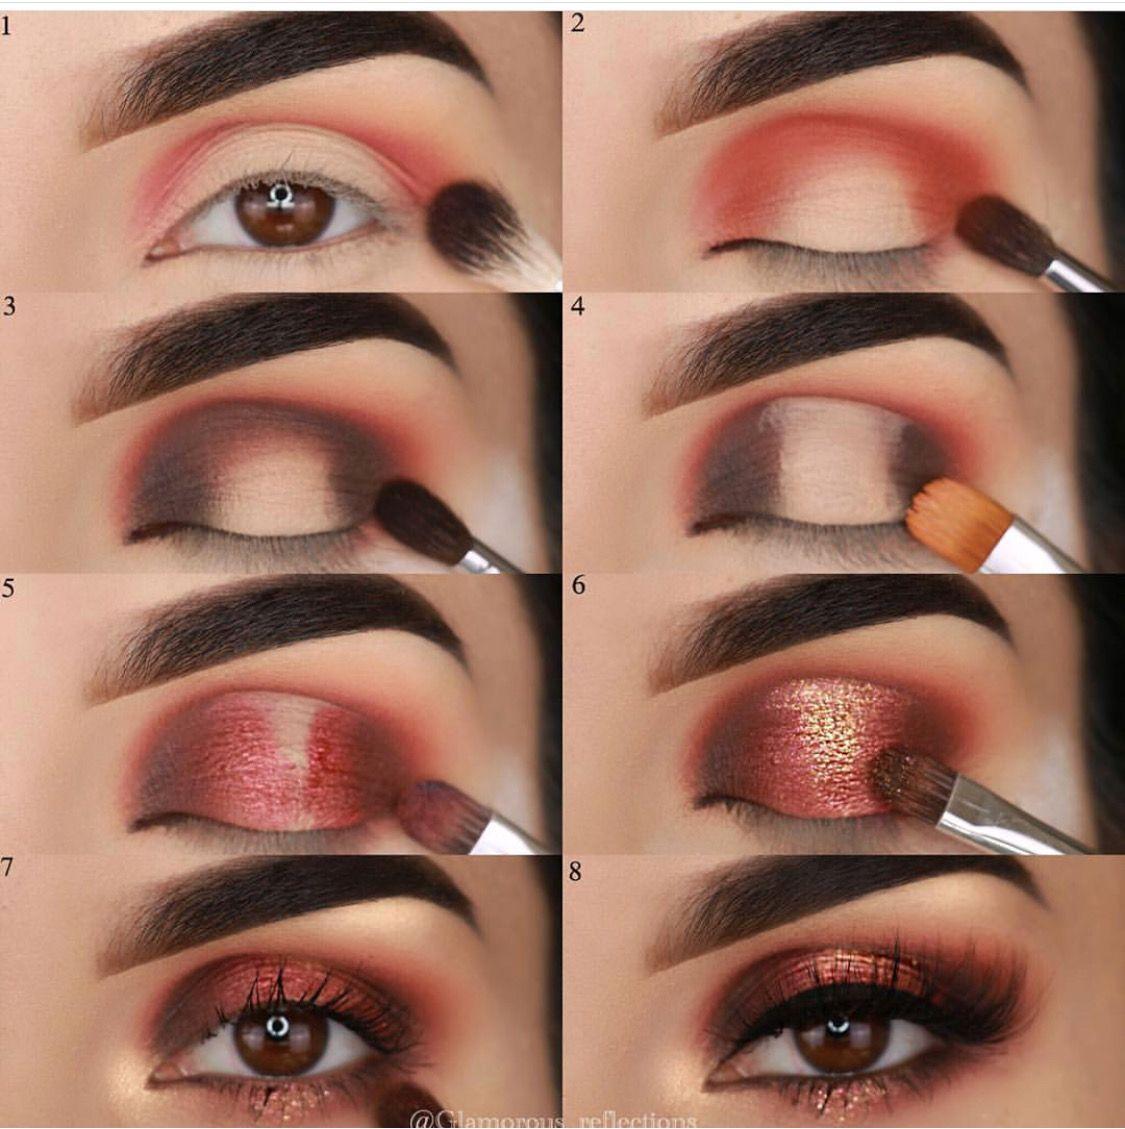 Pin by Maryanna Elmore on Makeup Looks  Pinterest makeup, Eye